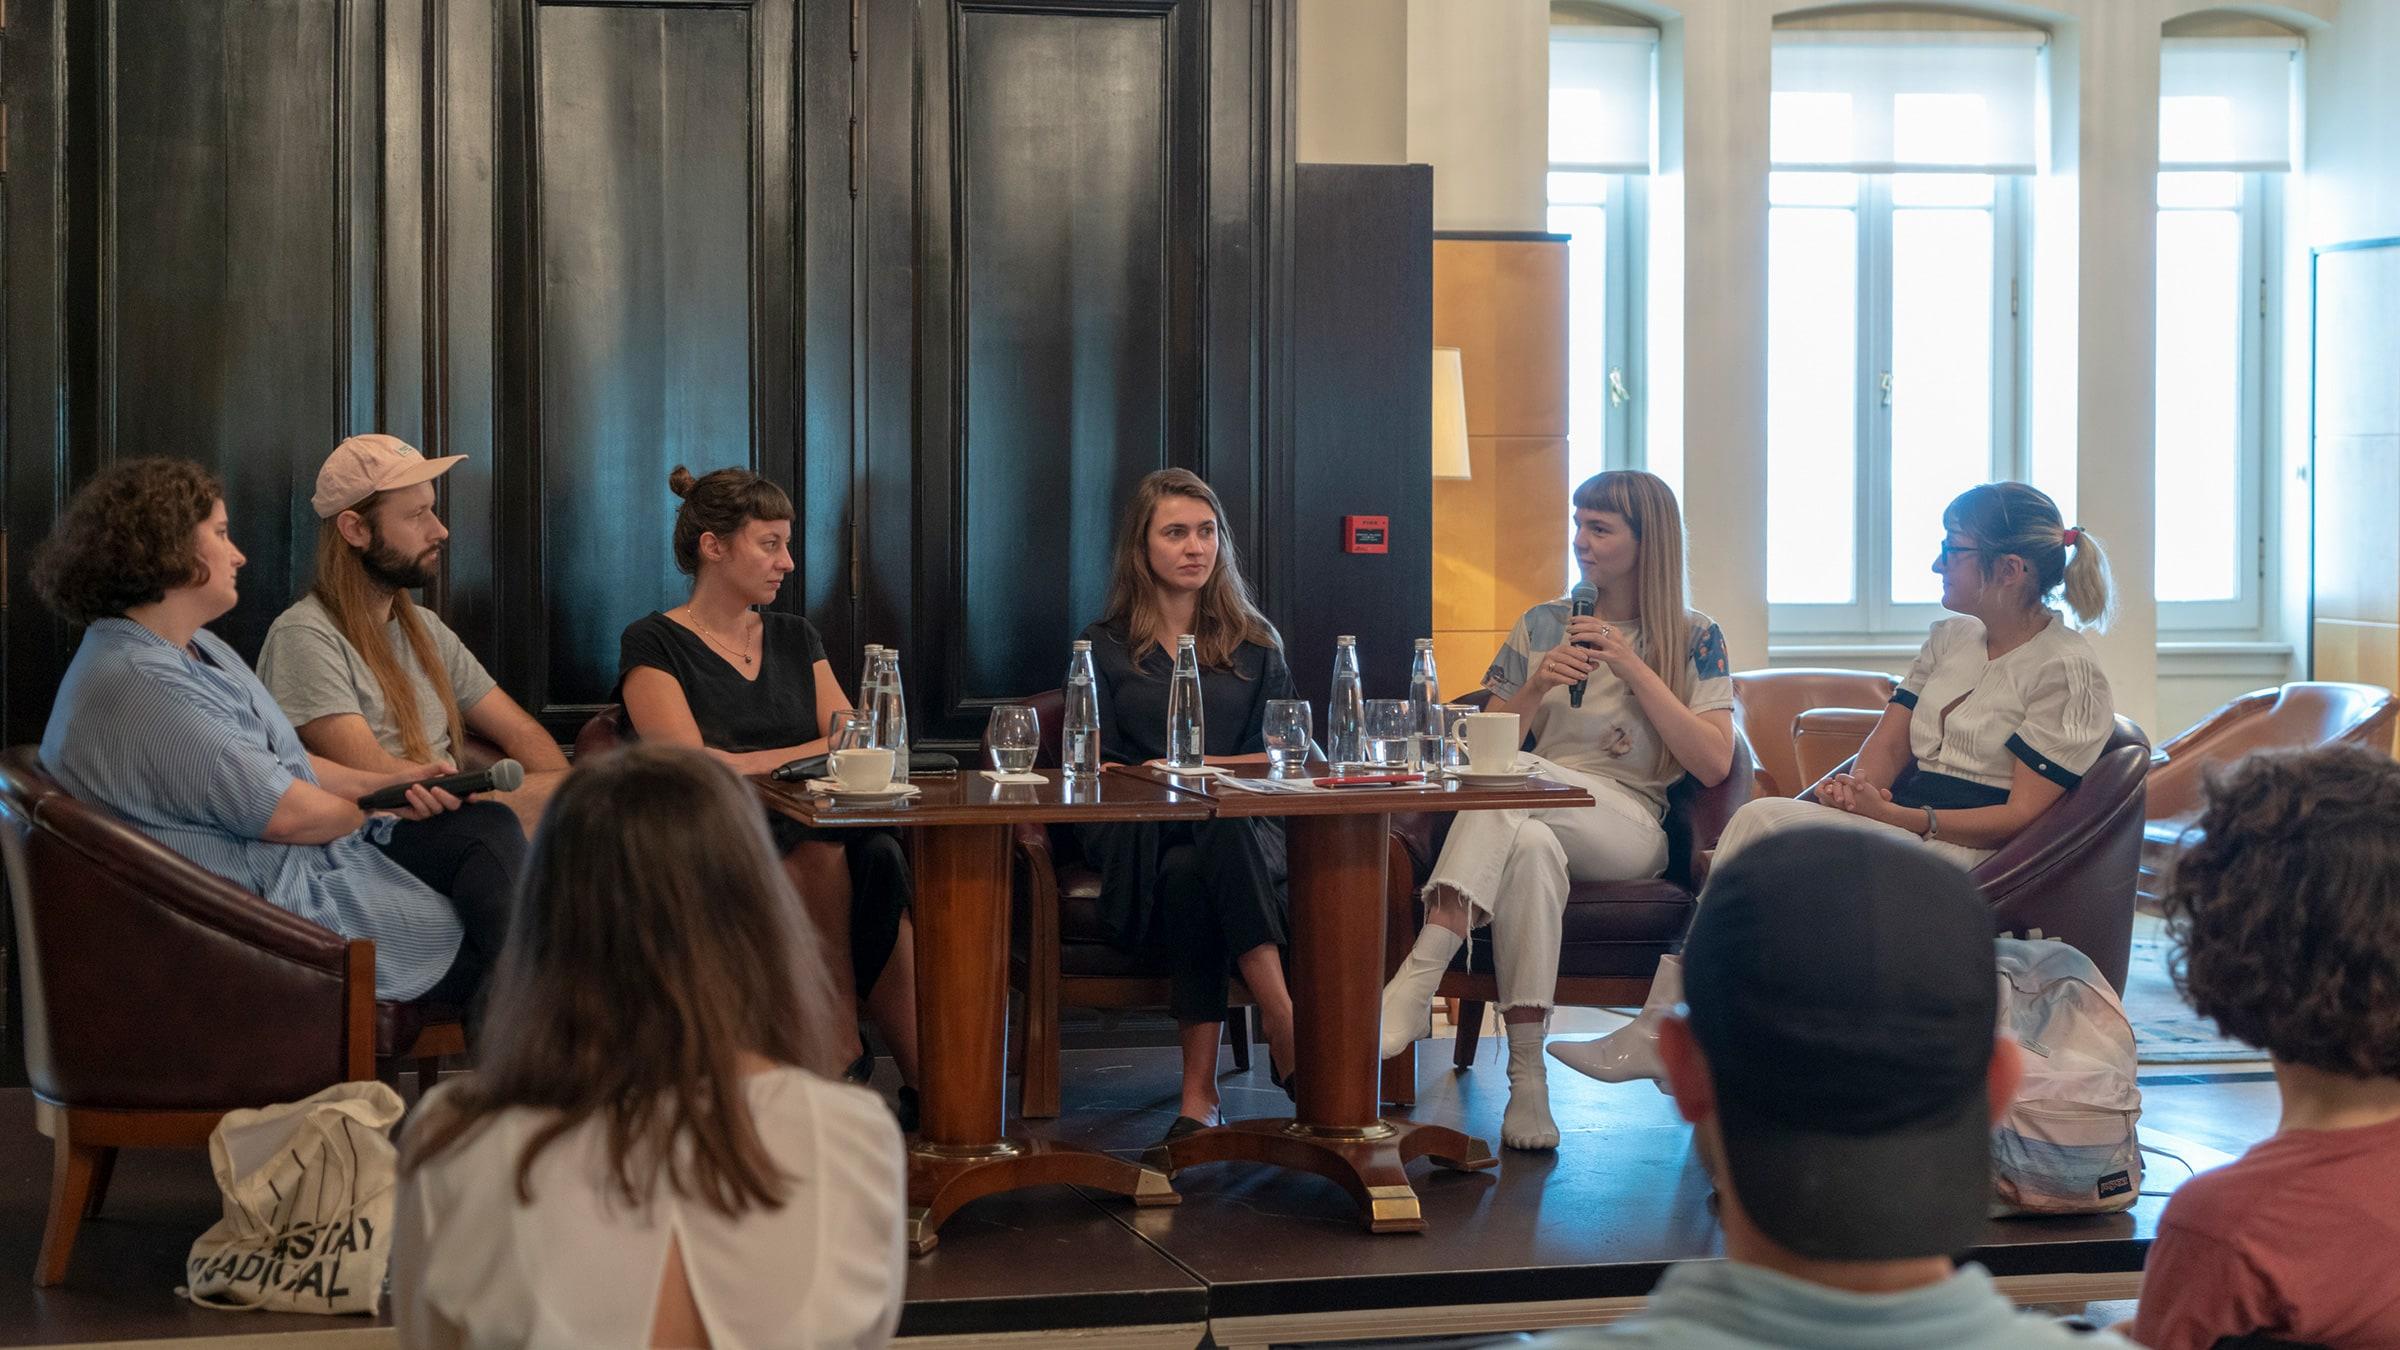 Designer Conversations <br> LegrandJäger + AATB